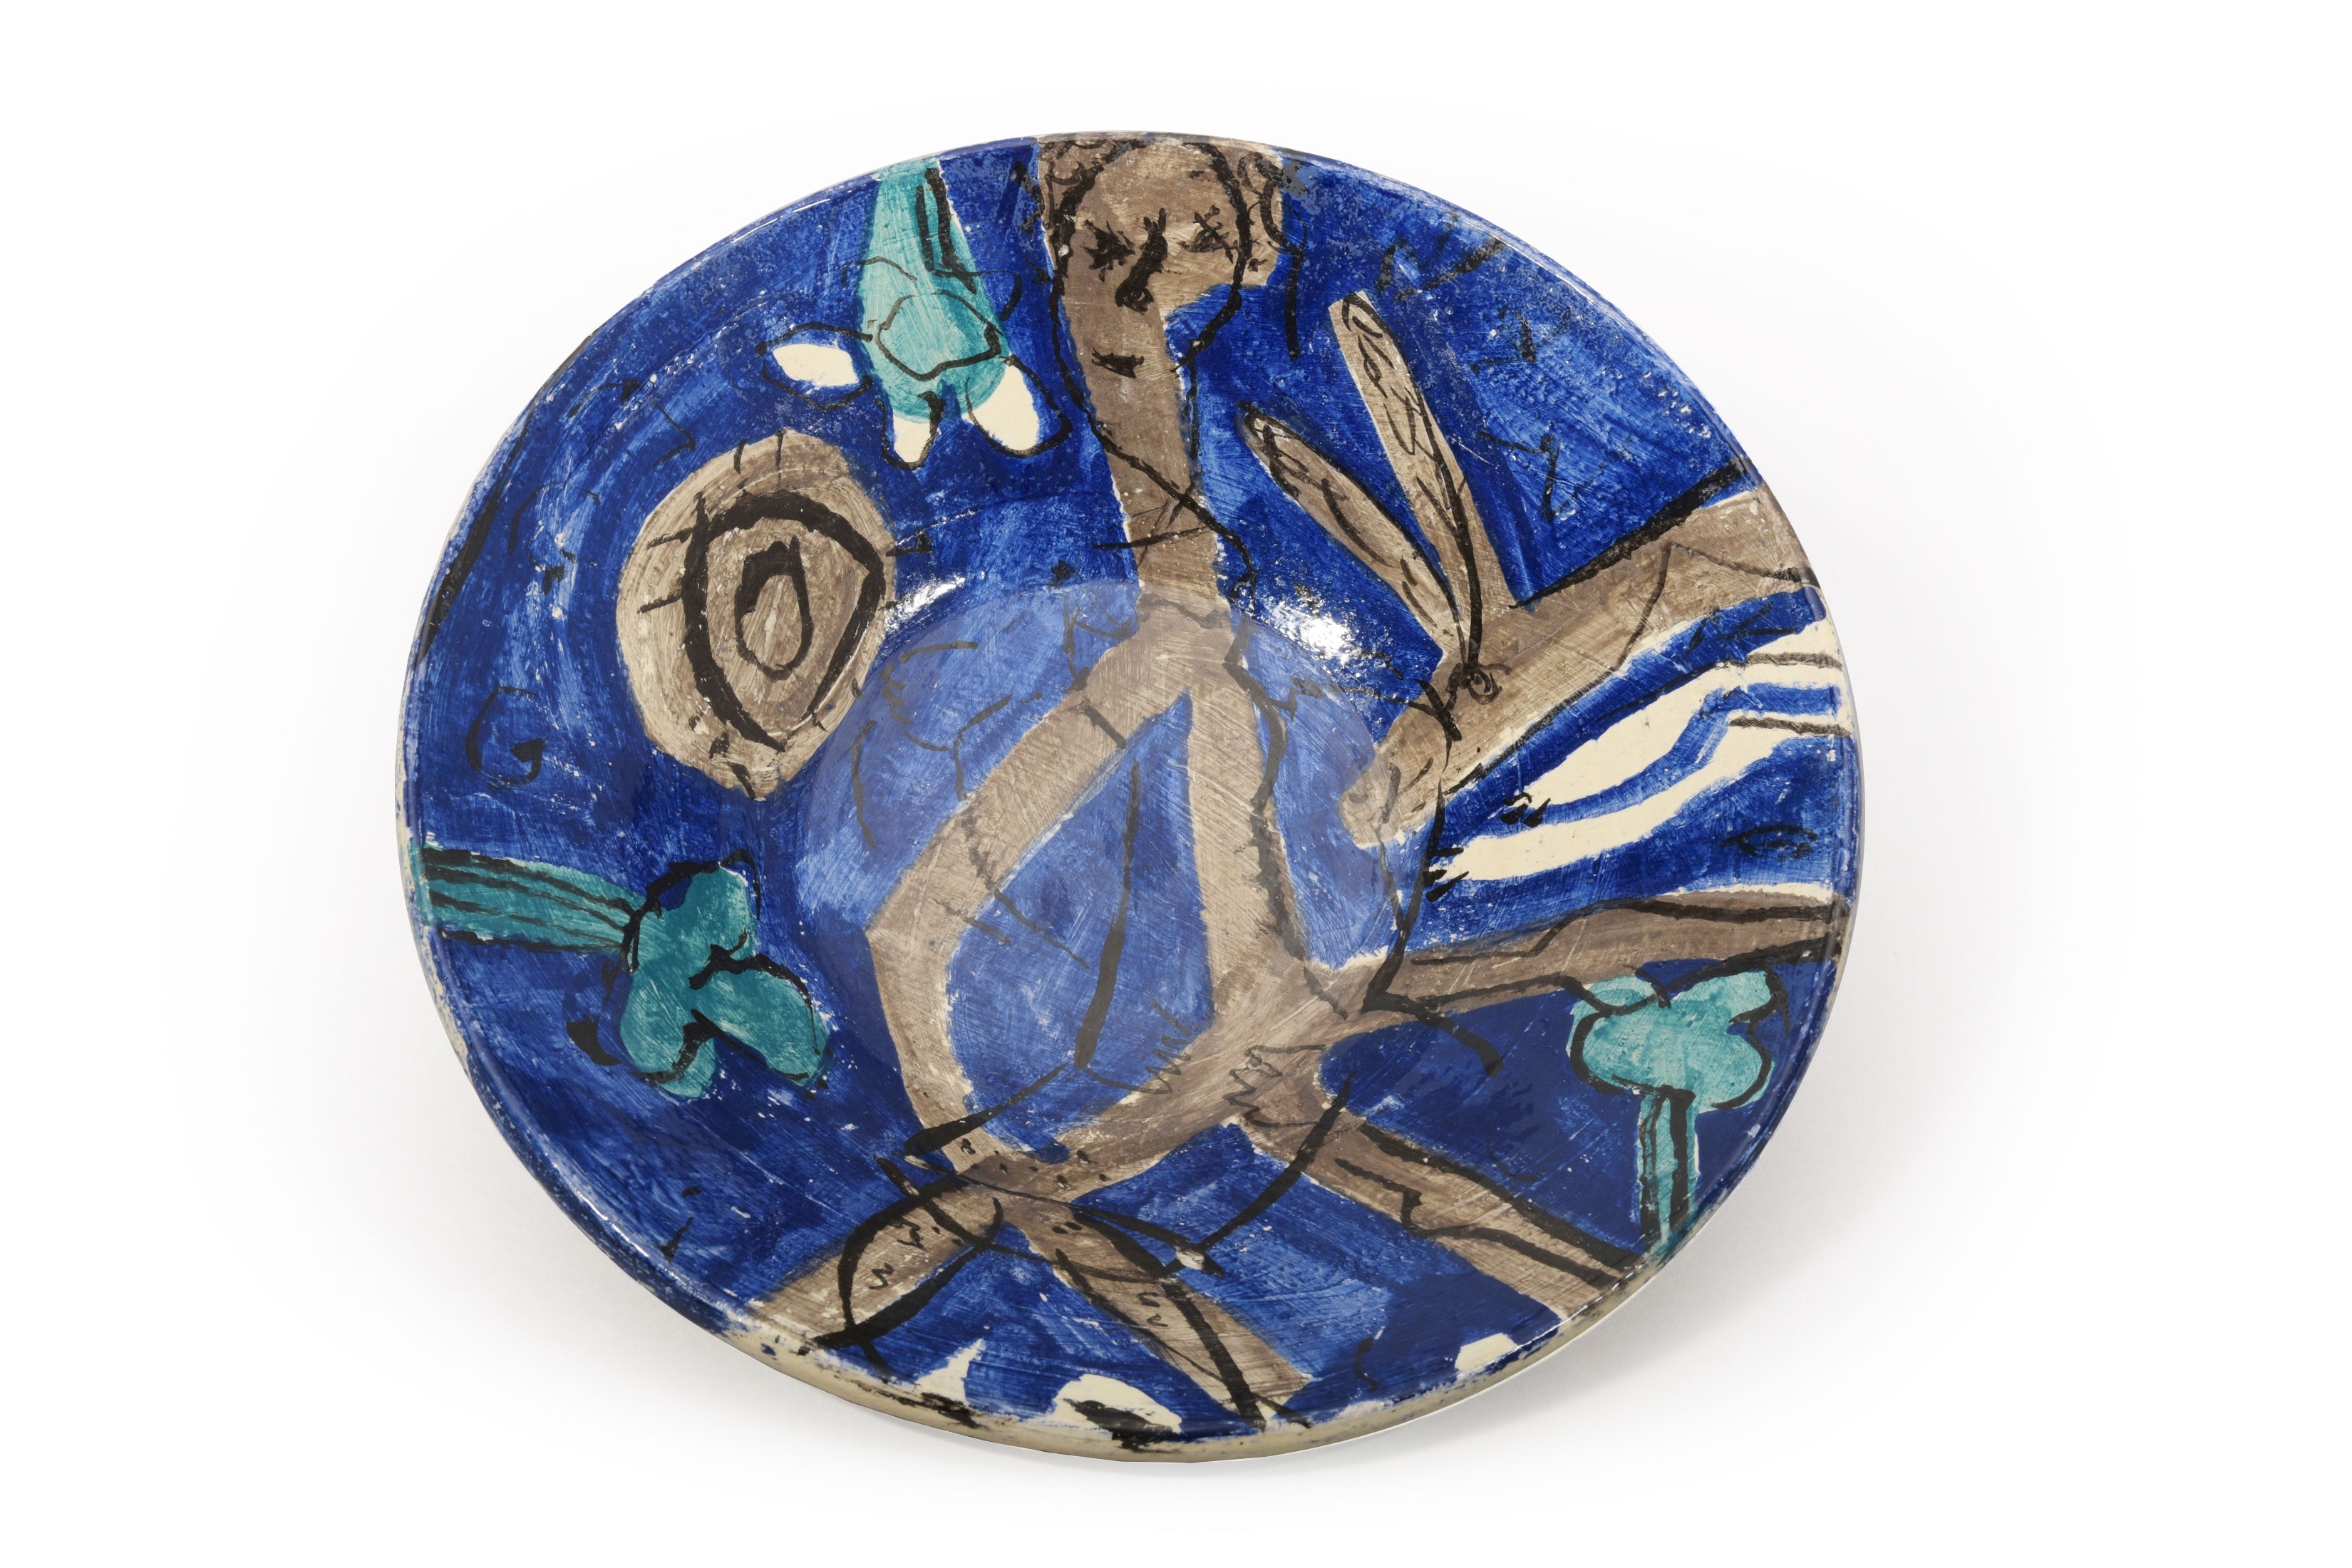 Hans Fischer –Schalenform, 2019 –galerie metzger ceramic contemorary object